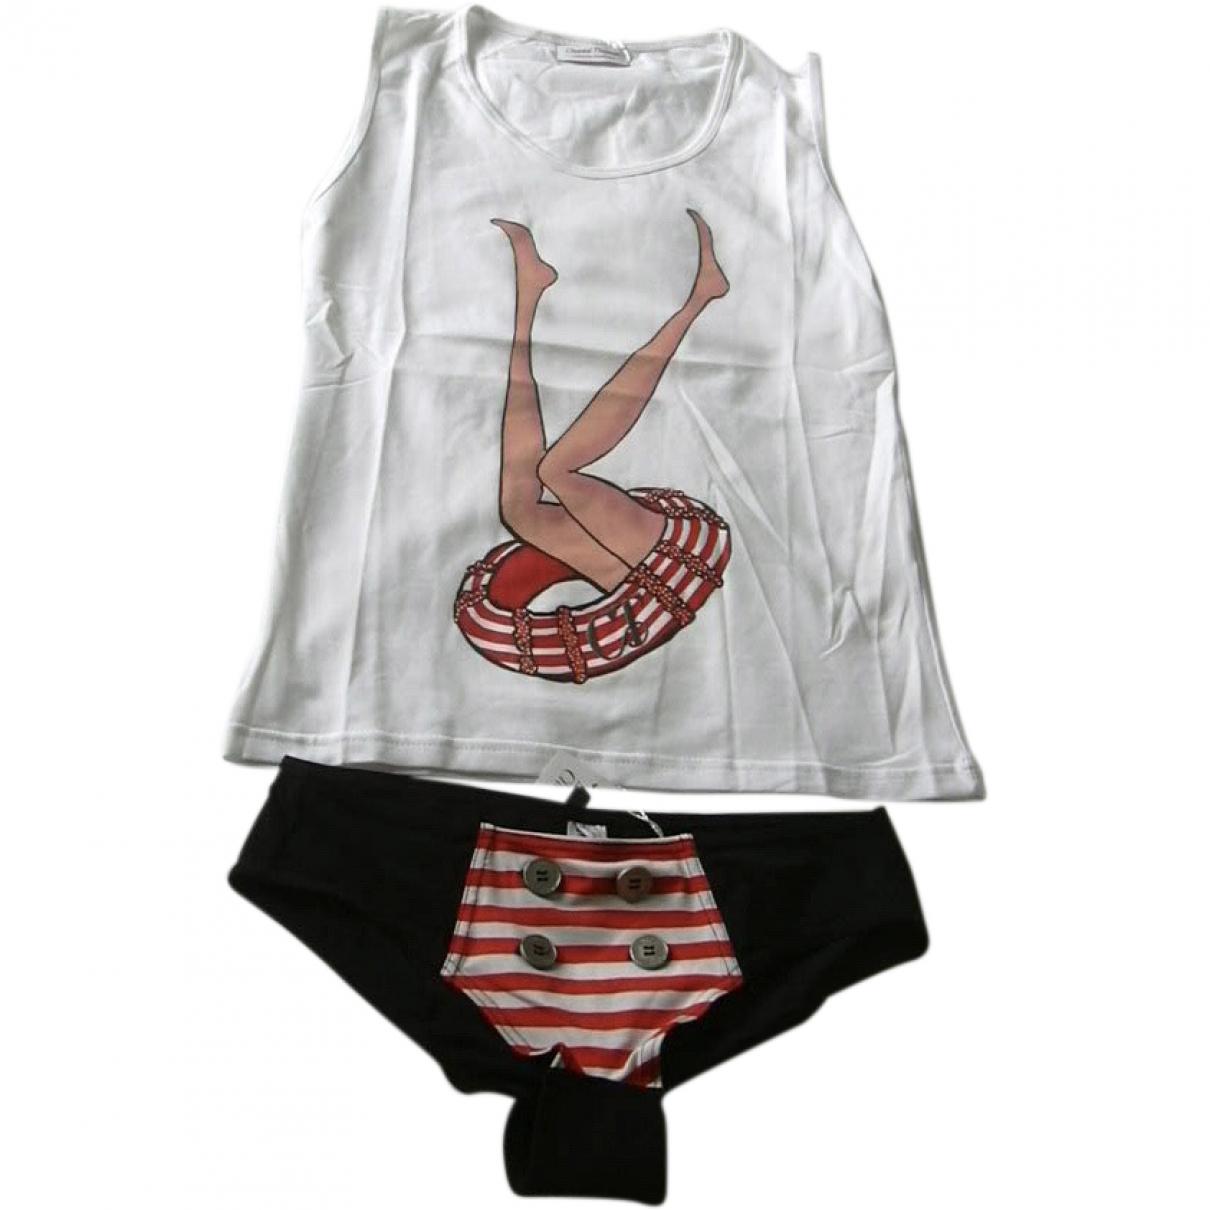 Chantal Thomass \N Multicolour Cotton - elasthane Swimwear for Women \N